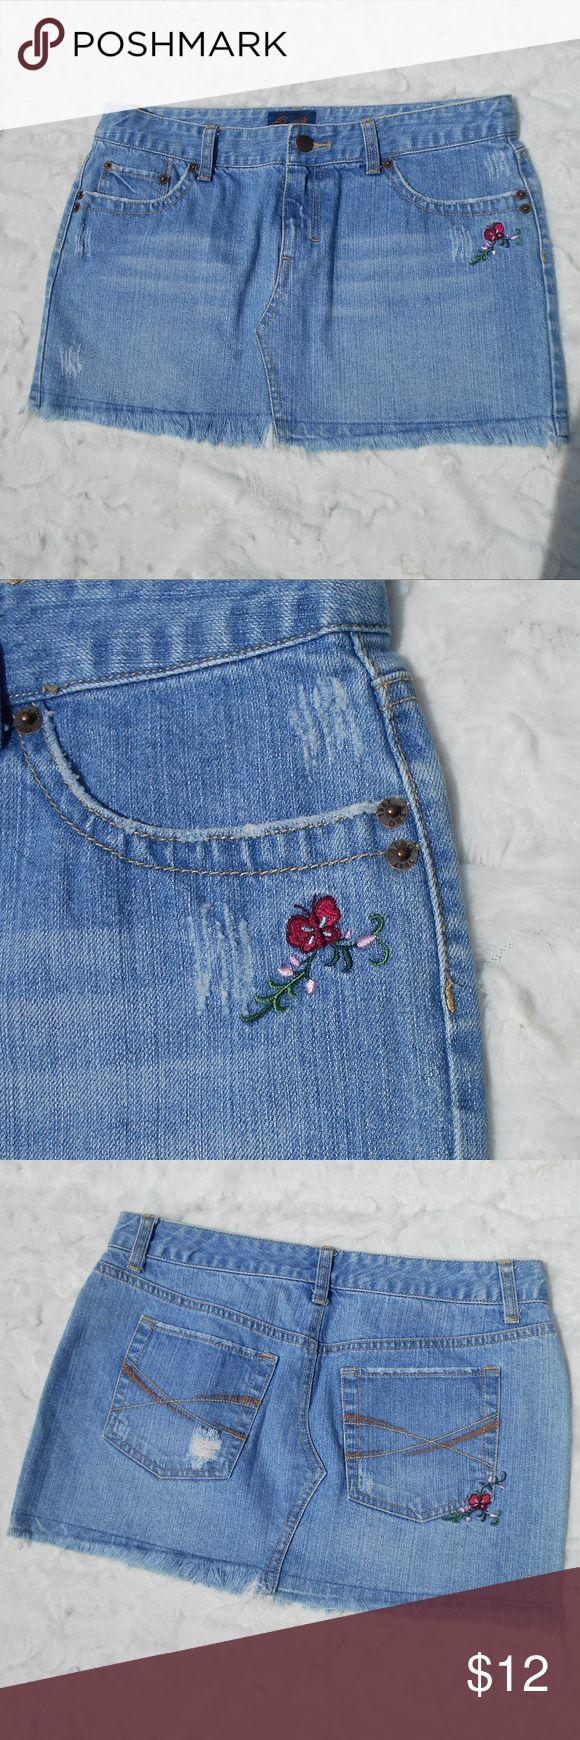 "Aeropostale Denim Embroidered Mini Skirt Aeropostale denim  embroidered mini skirt.  100% cotton, 12"" top to bottom.  Lightly distressed, size 5/6. Great condtion. Aeropostale Skirts Mini"